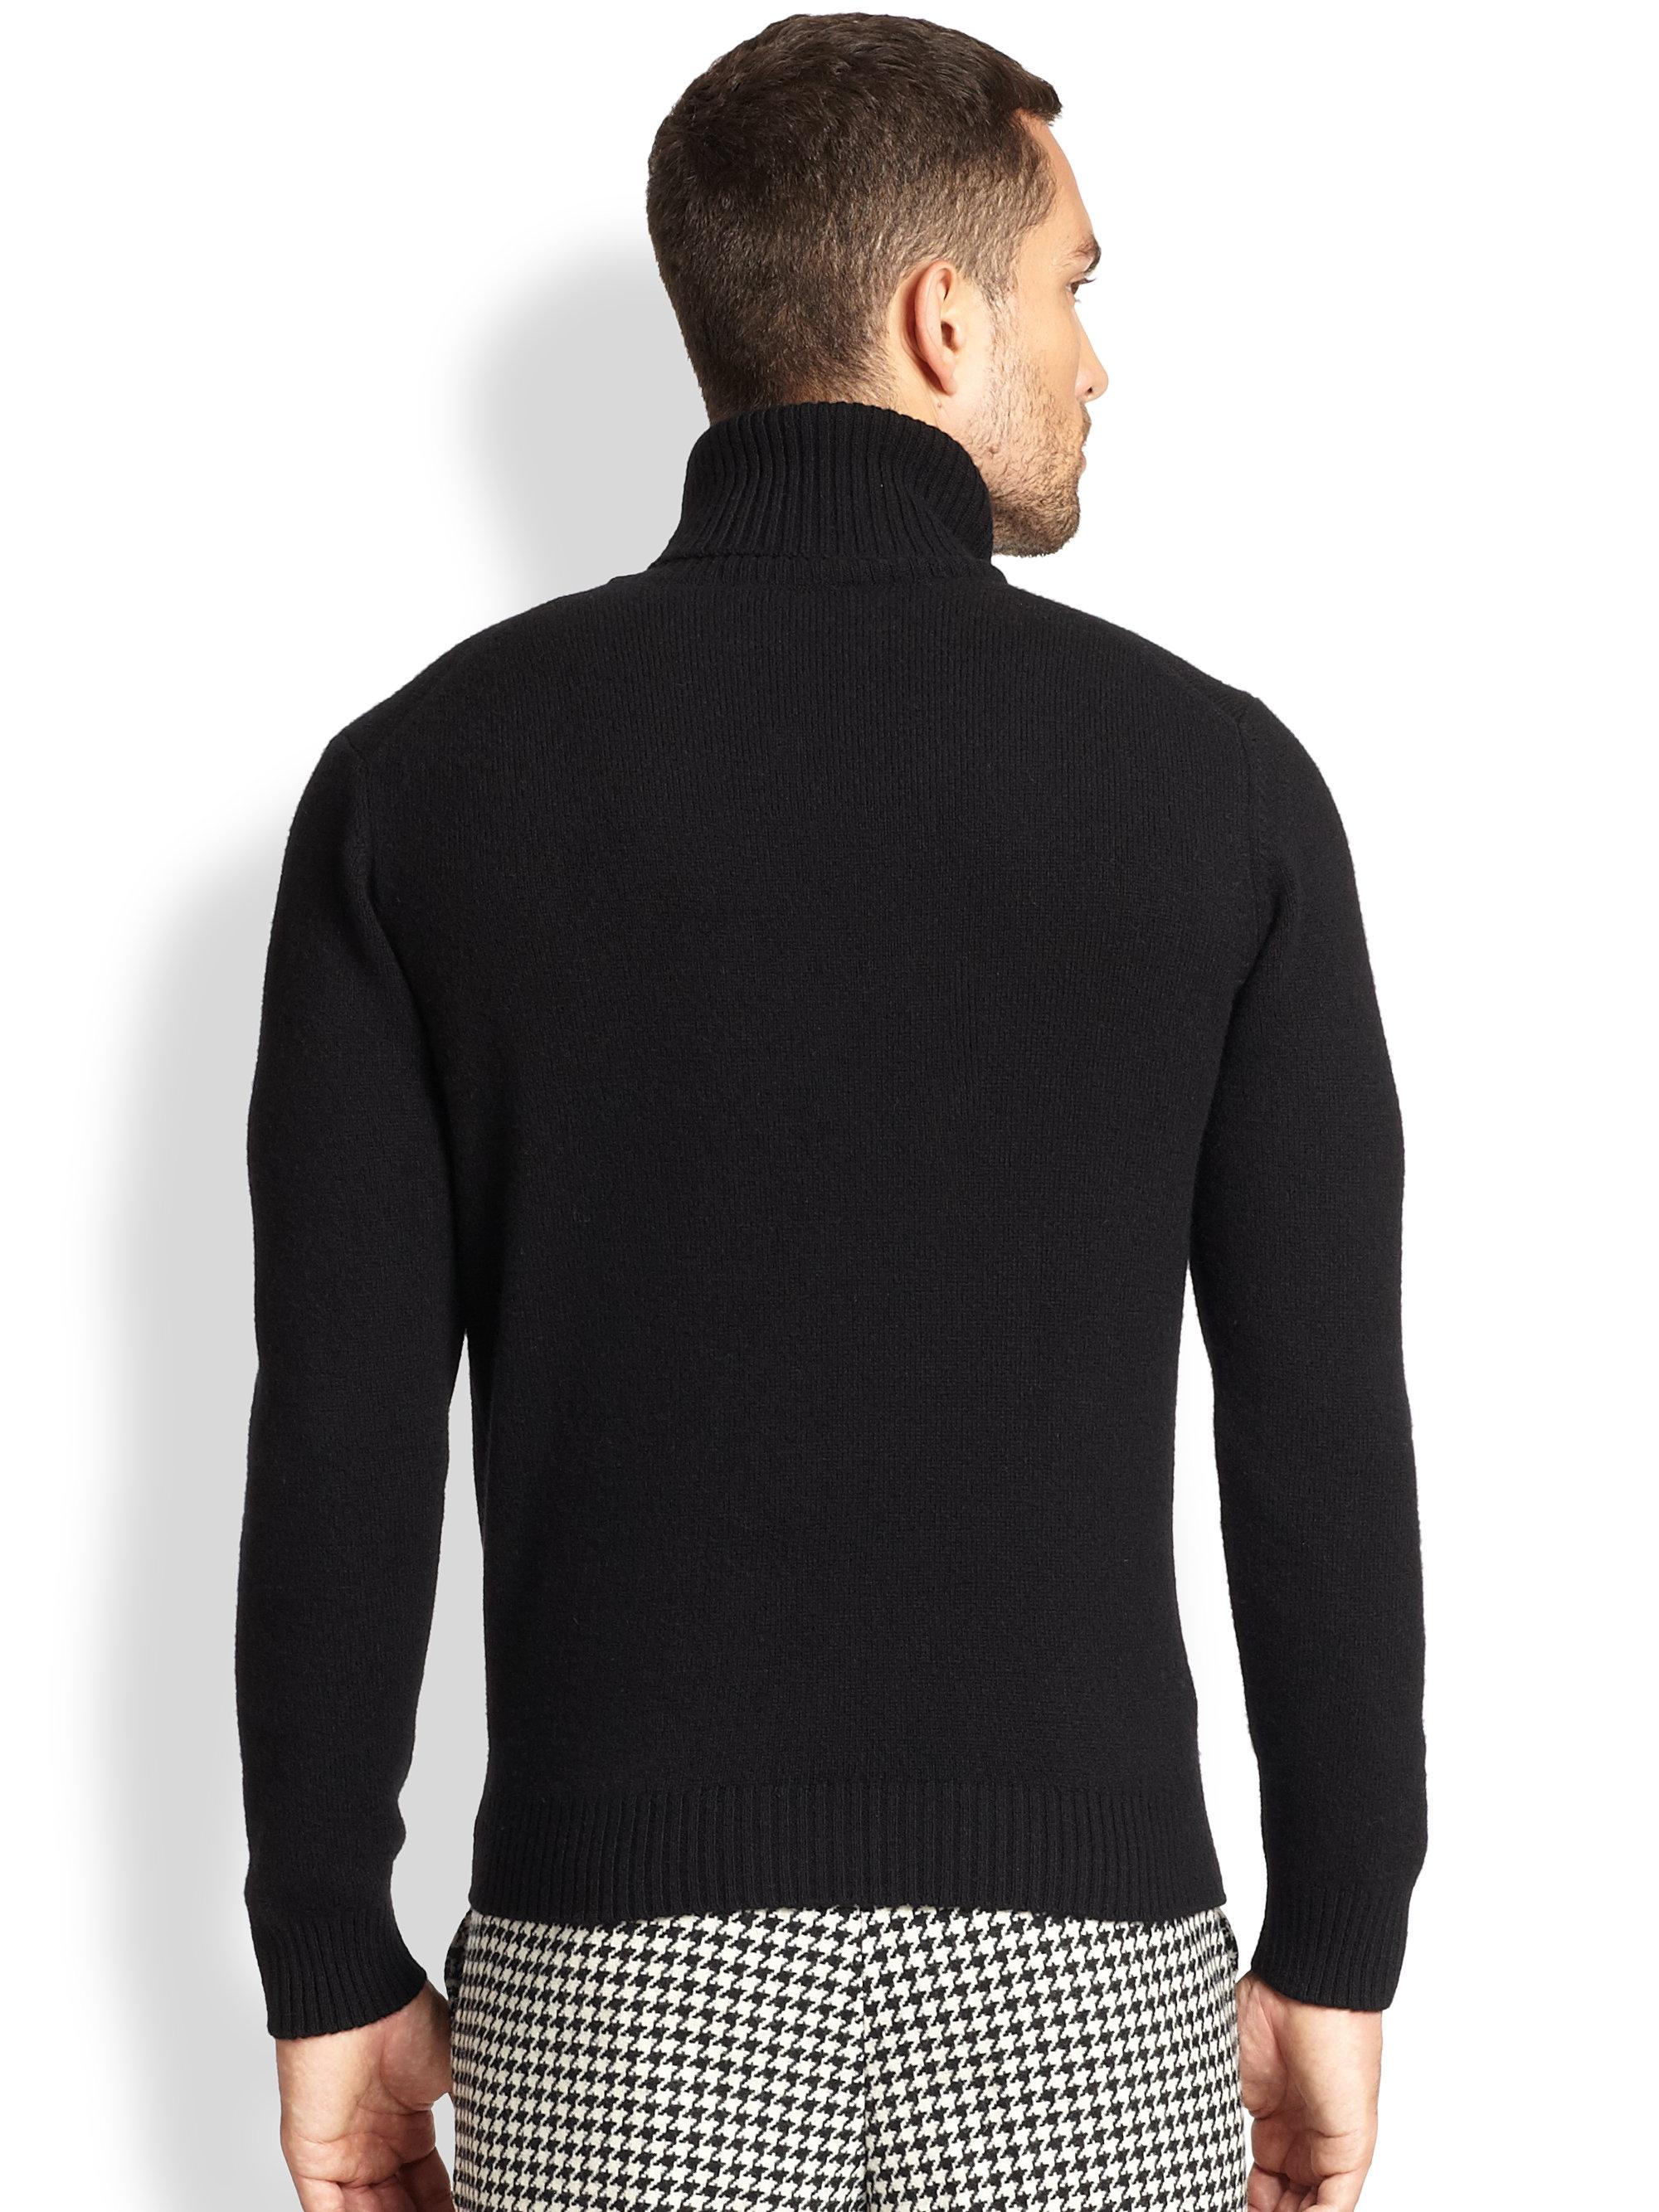 Ami Wool Turtleneck Sweater In Black For Men Lyst